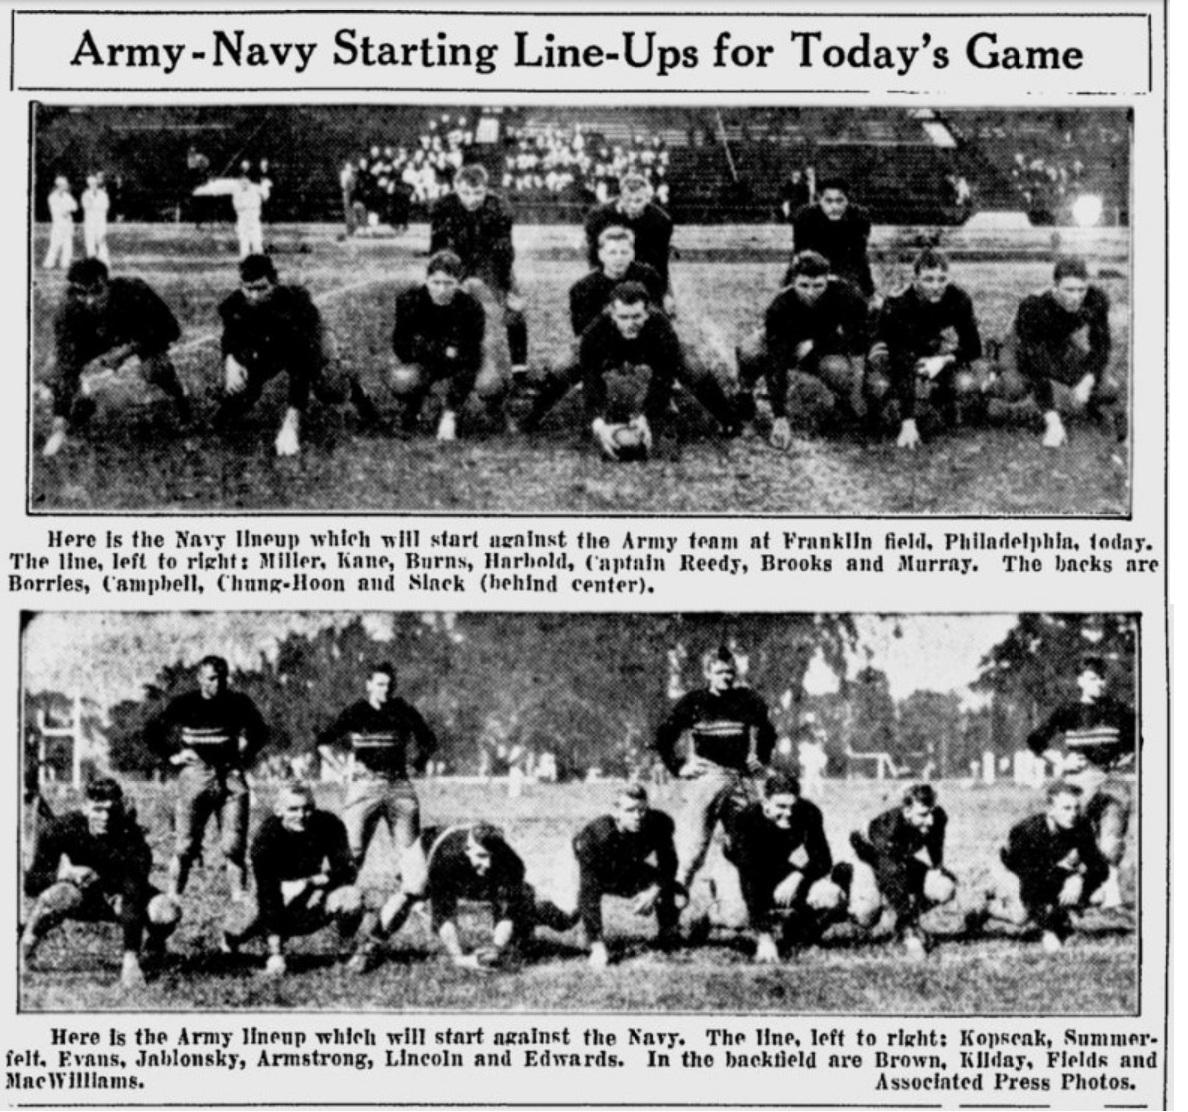 armyfb_1932_vsnavy-lineups_telegraph_dec31932